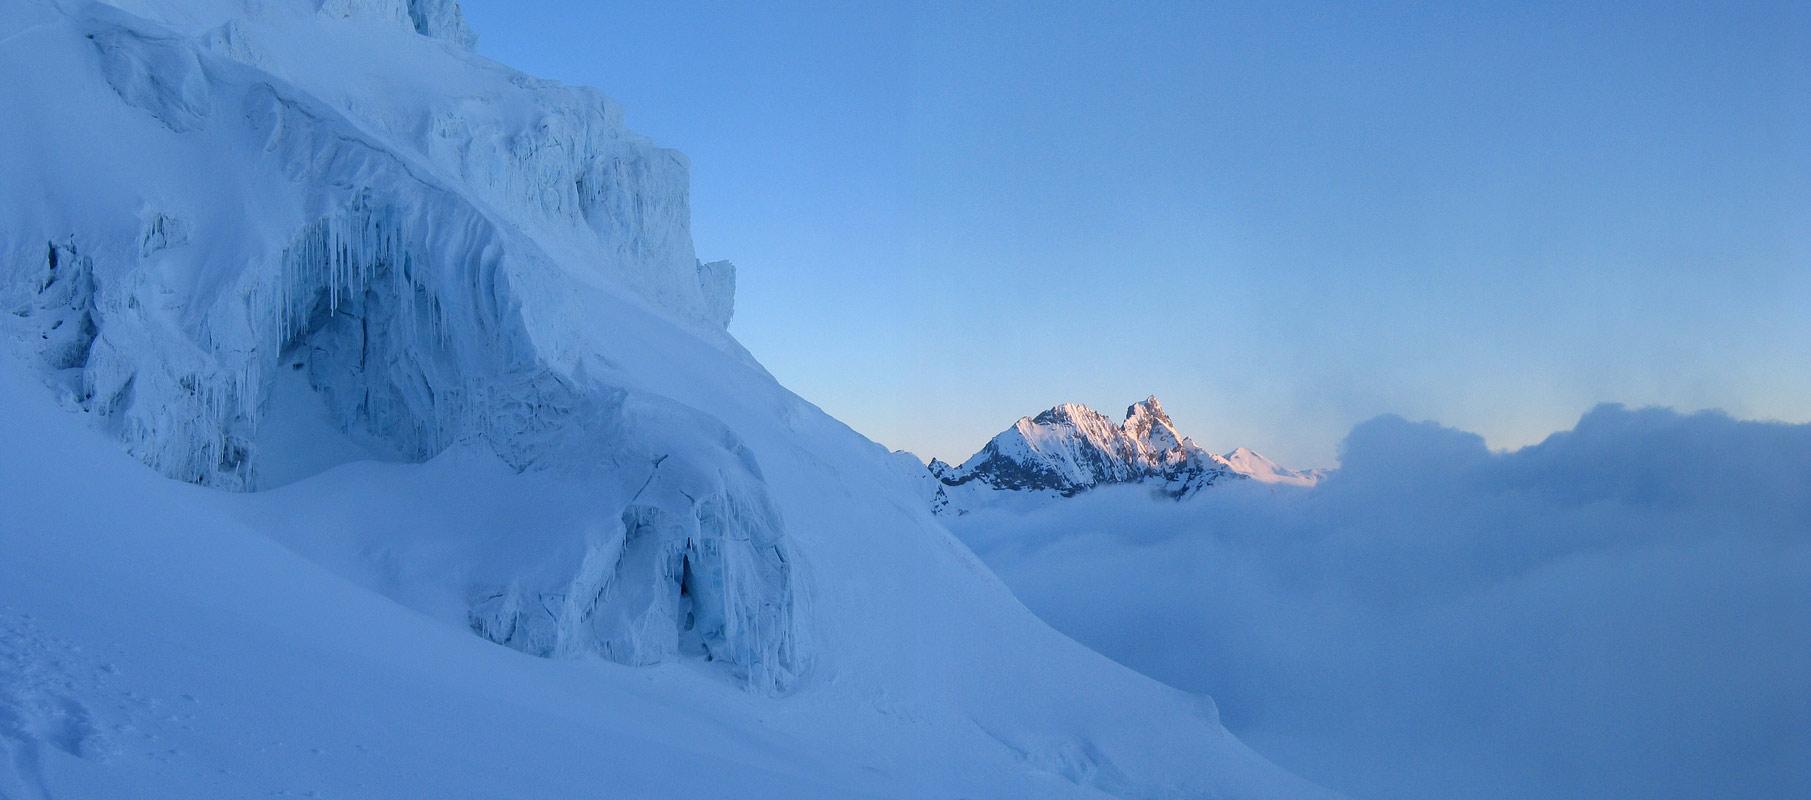 Col Valpelline, Day 6 H.R. Chamonix-Zermatt Walliser Alpen / Alpes valaisannes Švýcarsko panorama 16